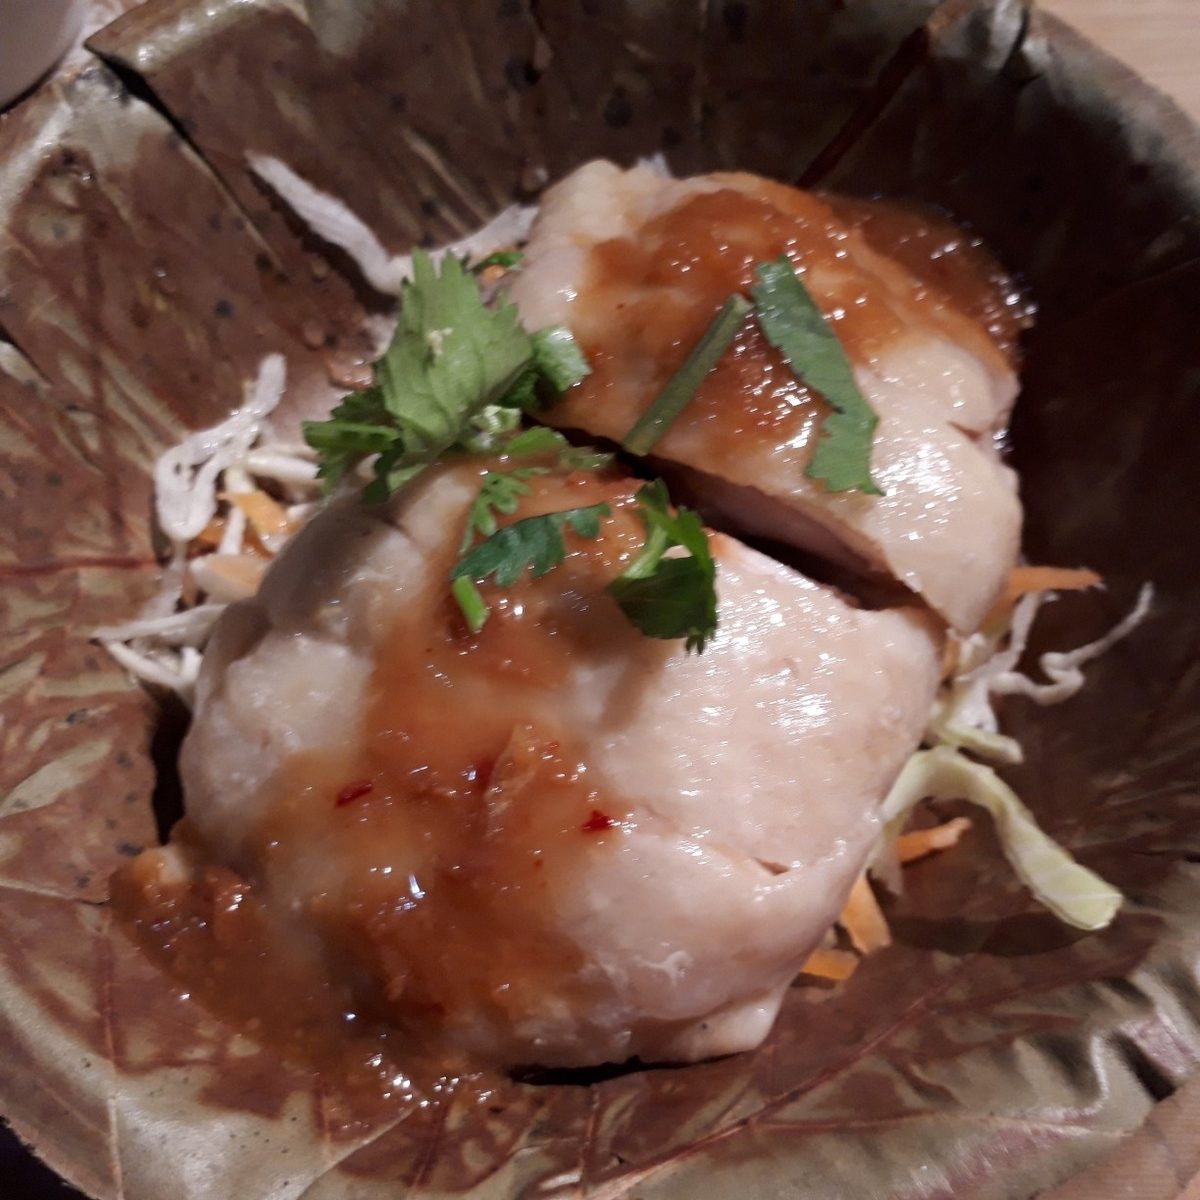 Asian kitchen cafe 百福 カオマンガイ(タイ式茹で鶏)